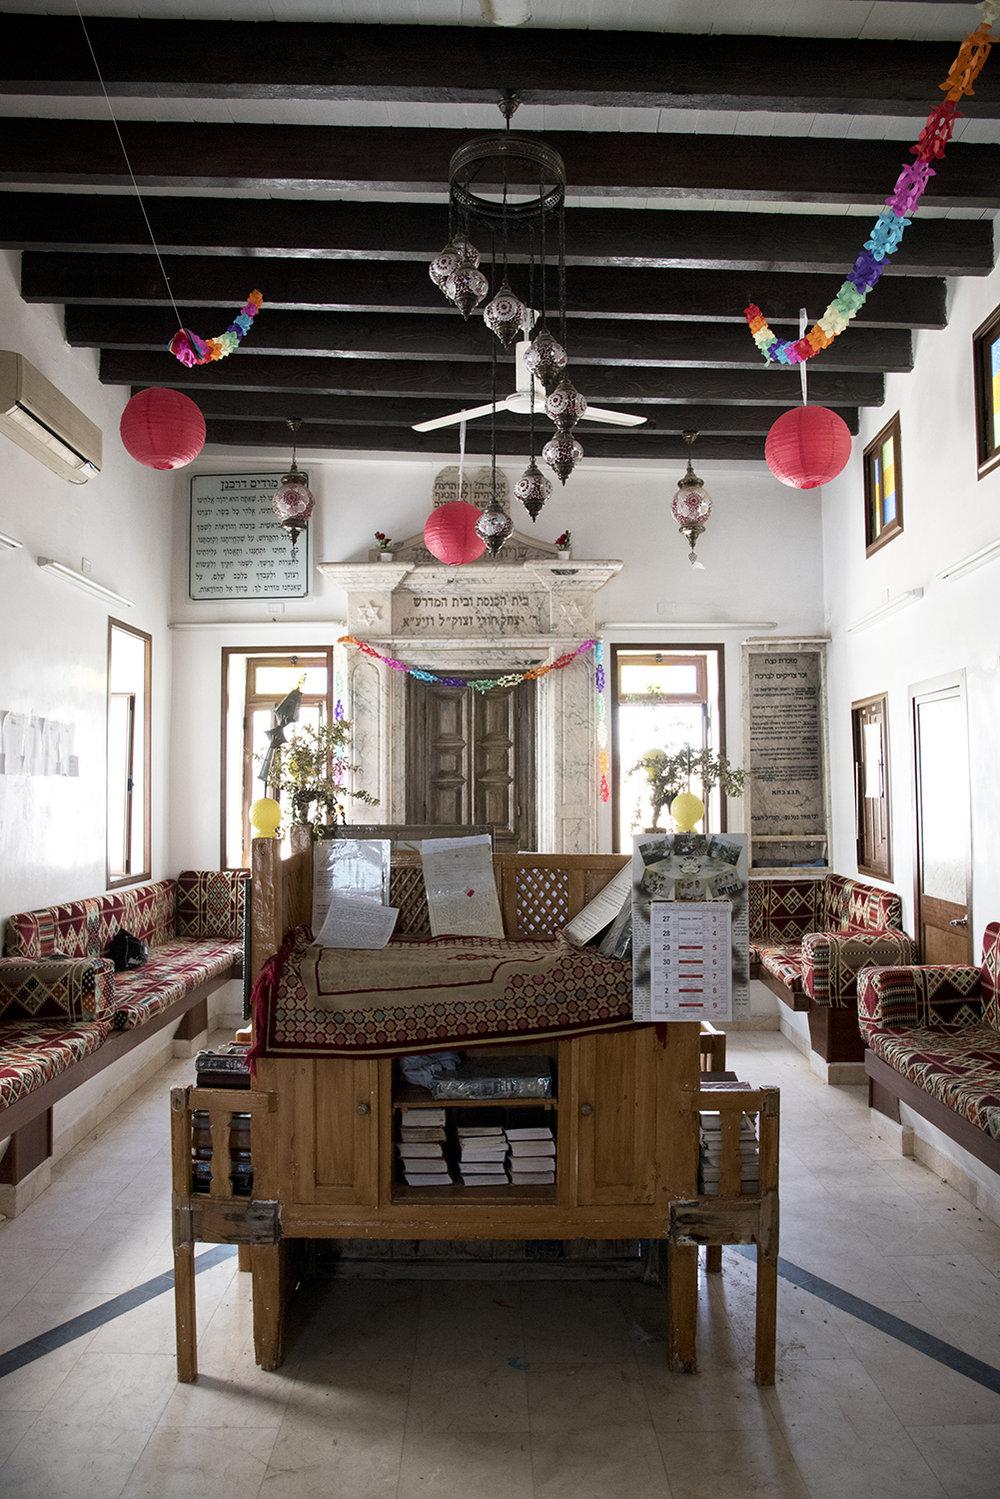 slat Yizhak Hori interior. Hara Kbira, Djerba, Tunisia